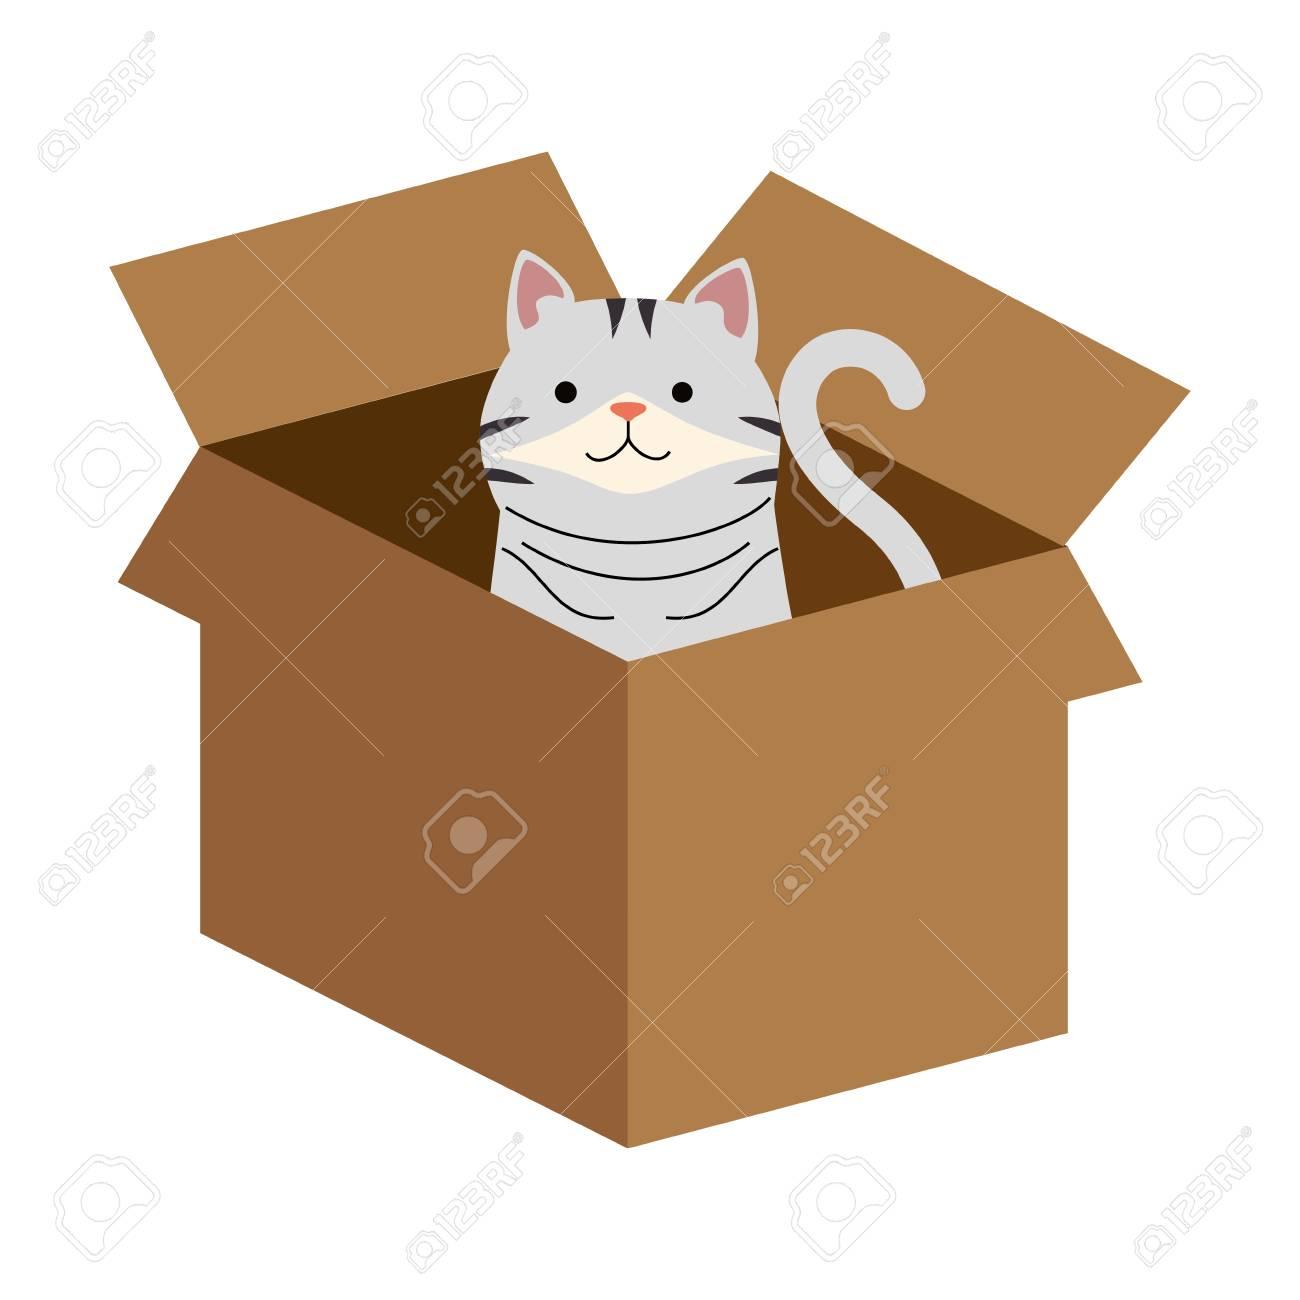 A cute cat in carton box vector illustration design - 99889545